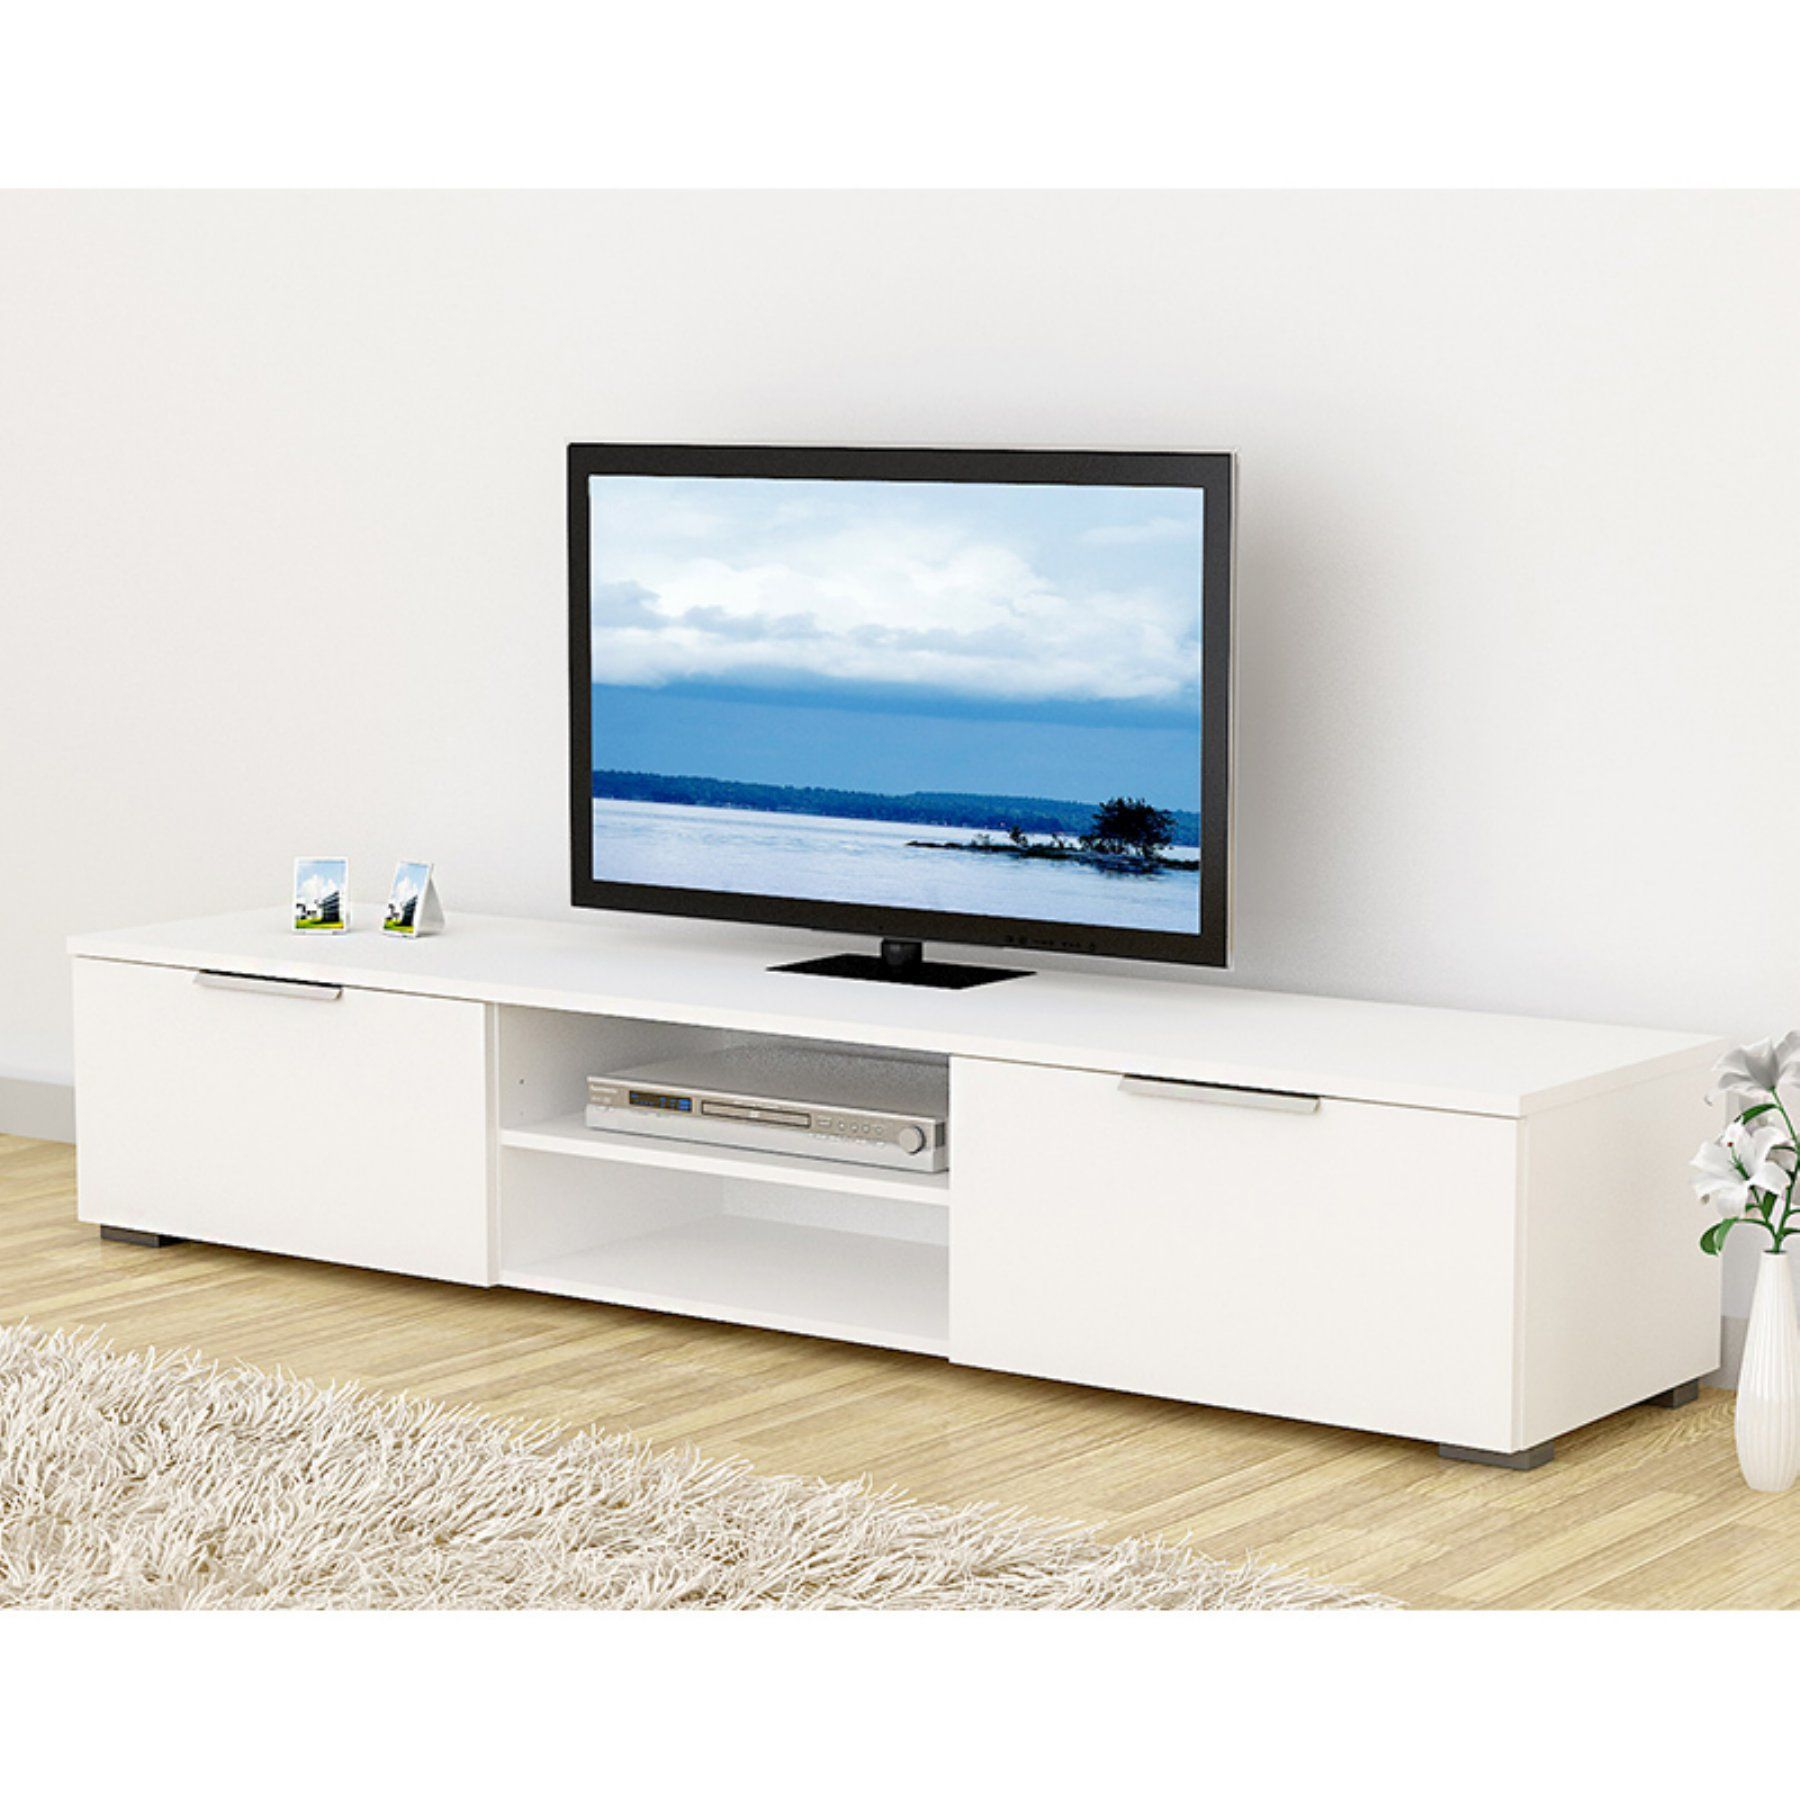 Tvilum Match Tv Stand With Adjustable Shelves White 70189uuuu